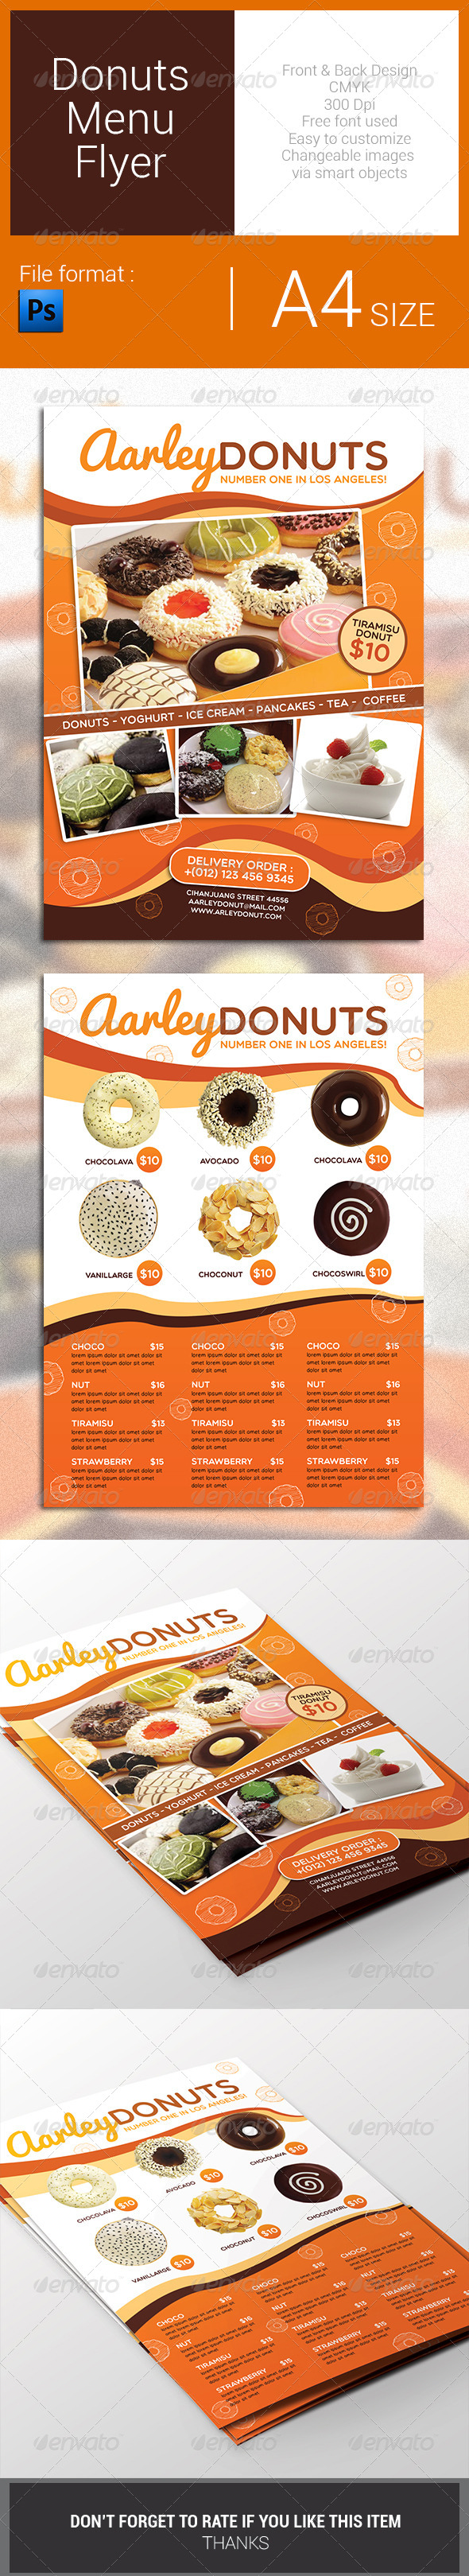 GraphicRiver Donuts Menu Flyer 7823541